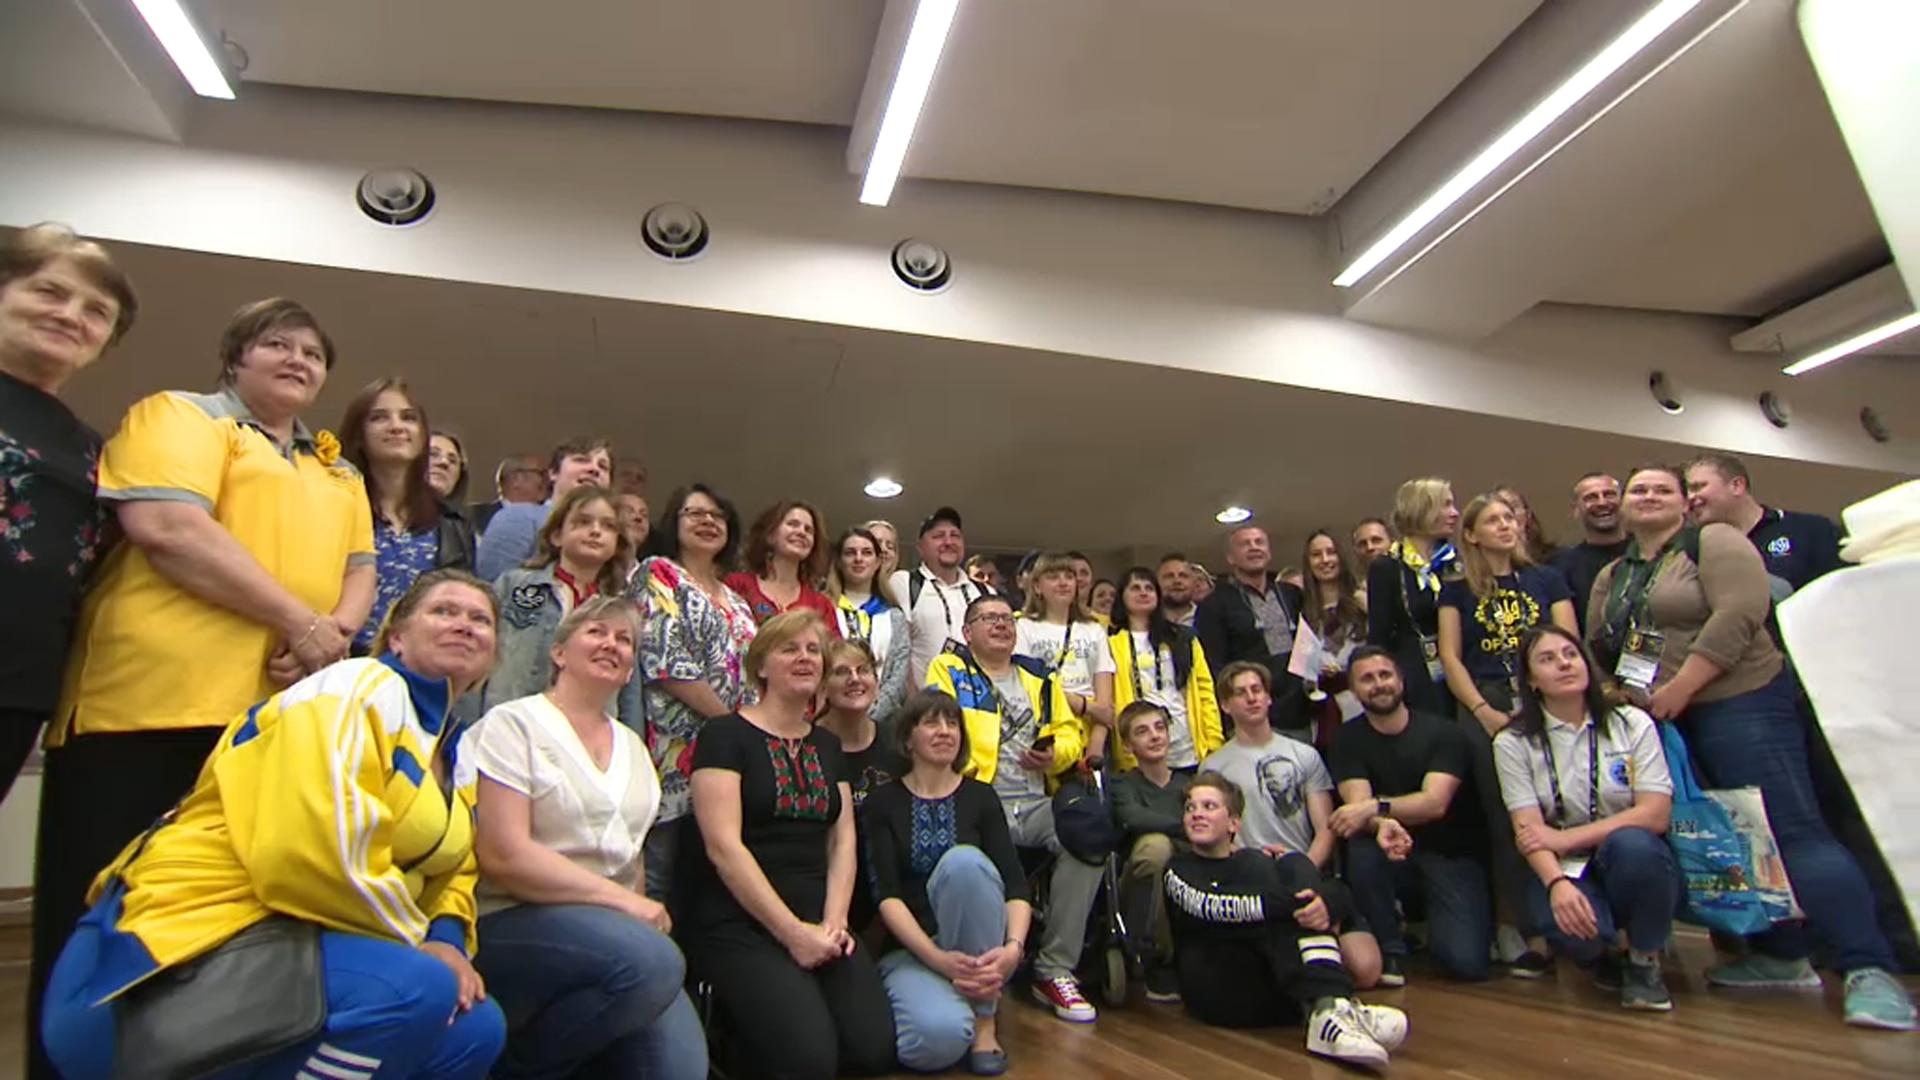 Ukraine community in Sydney pose with Invictus athletes